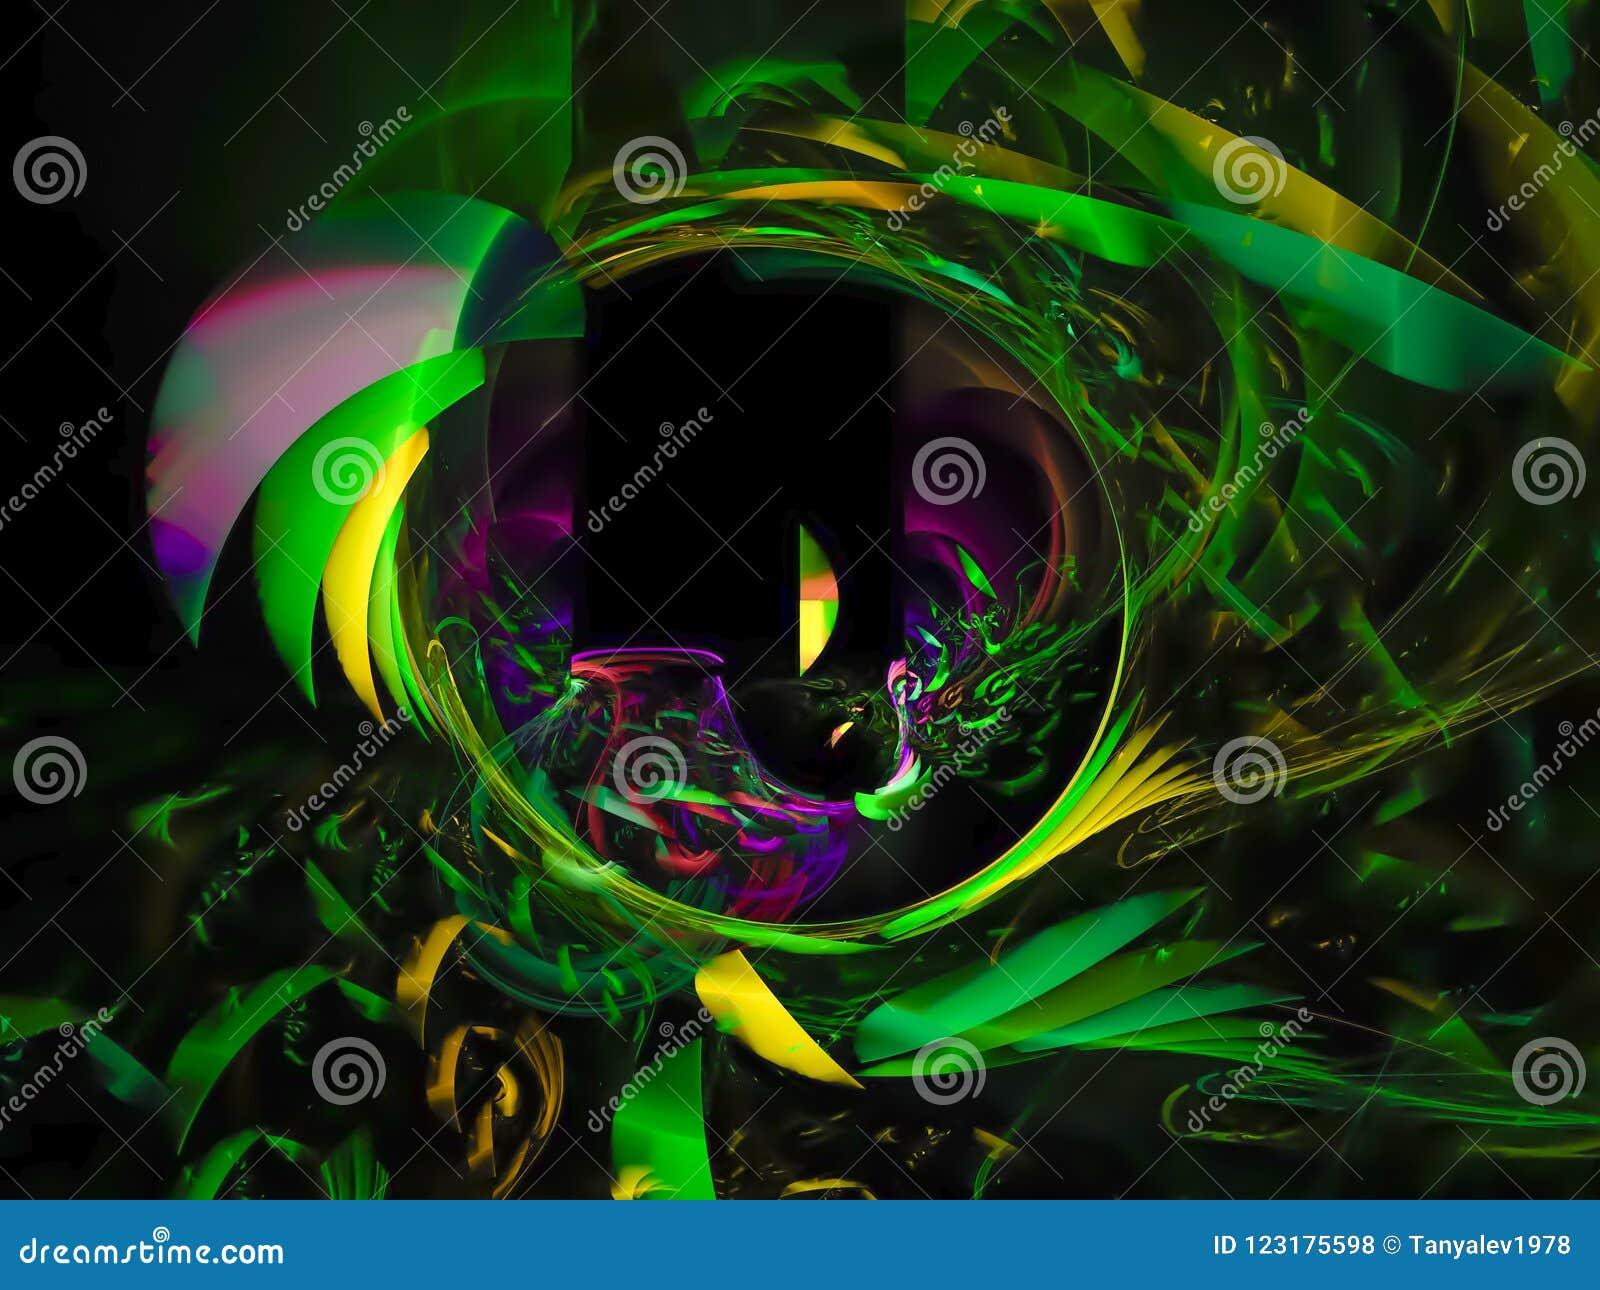 abstract vibrant digital overlay shine deep cybernetic design